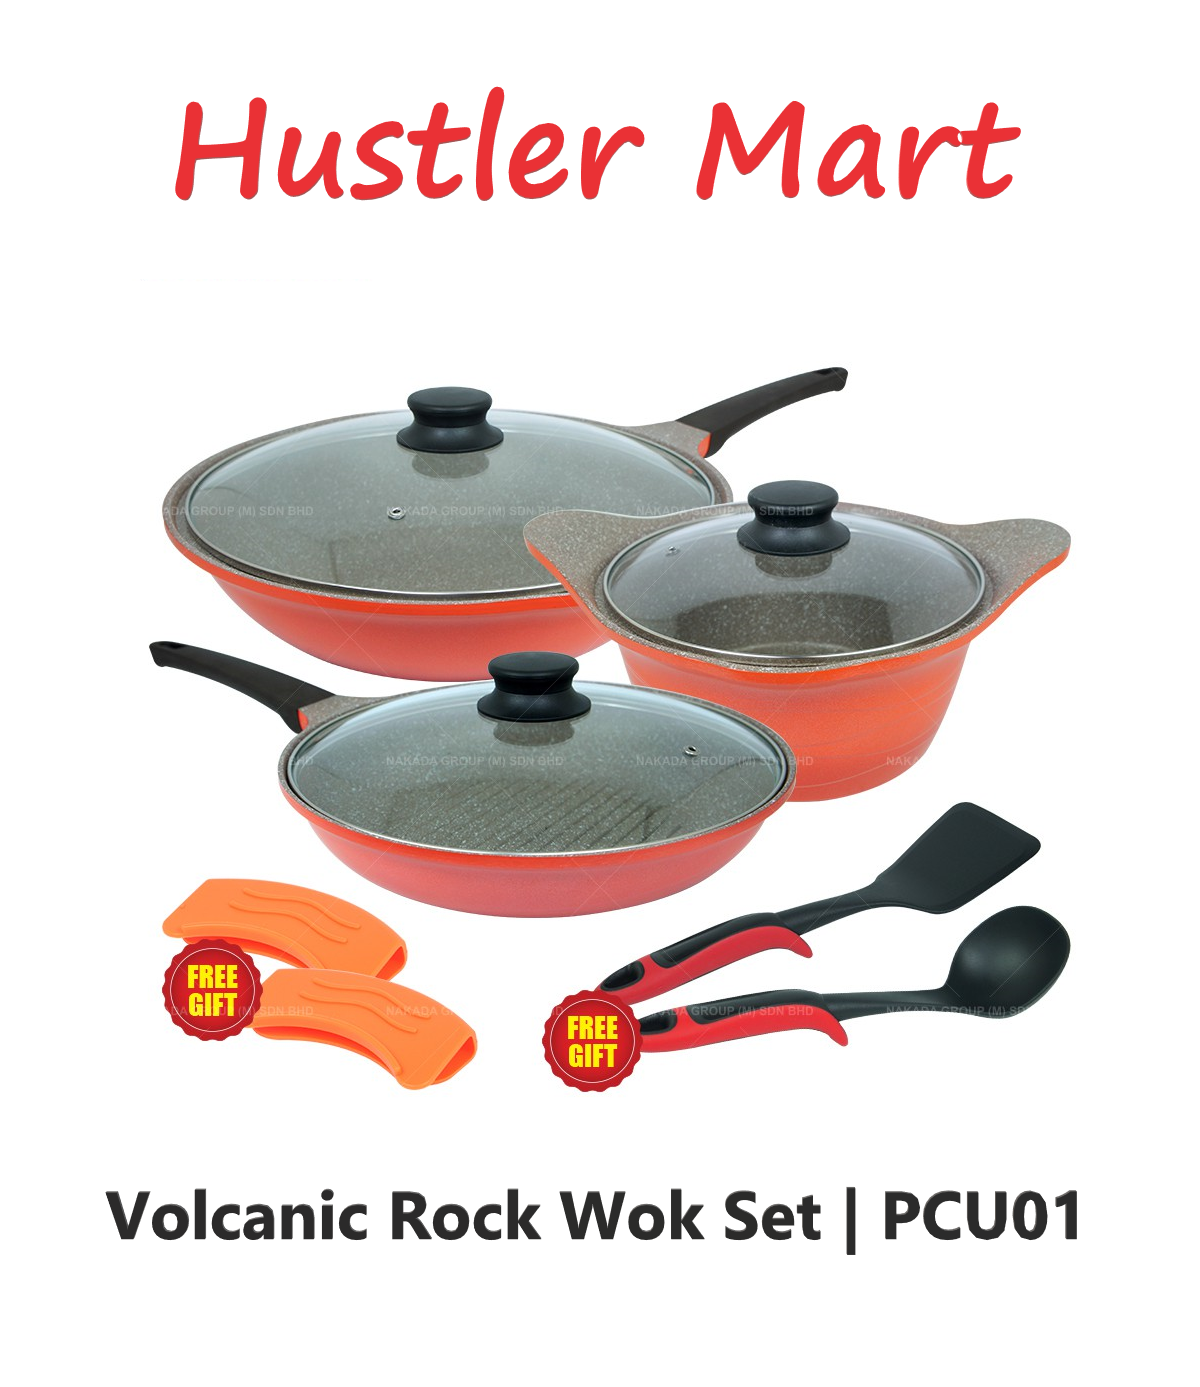 Cuoco Volcanic Rock Wok Set PCU01